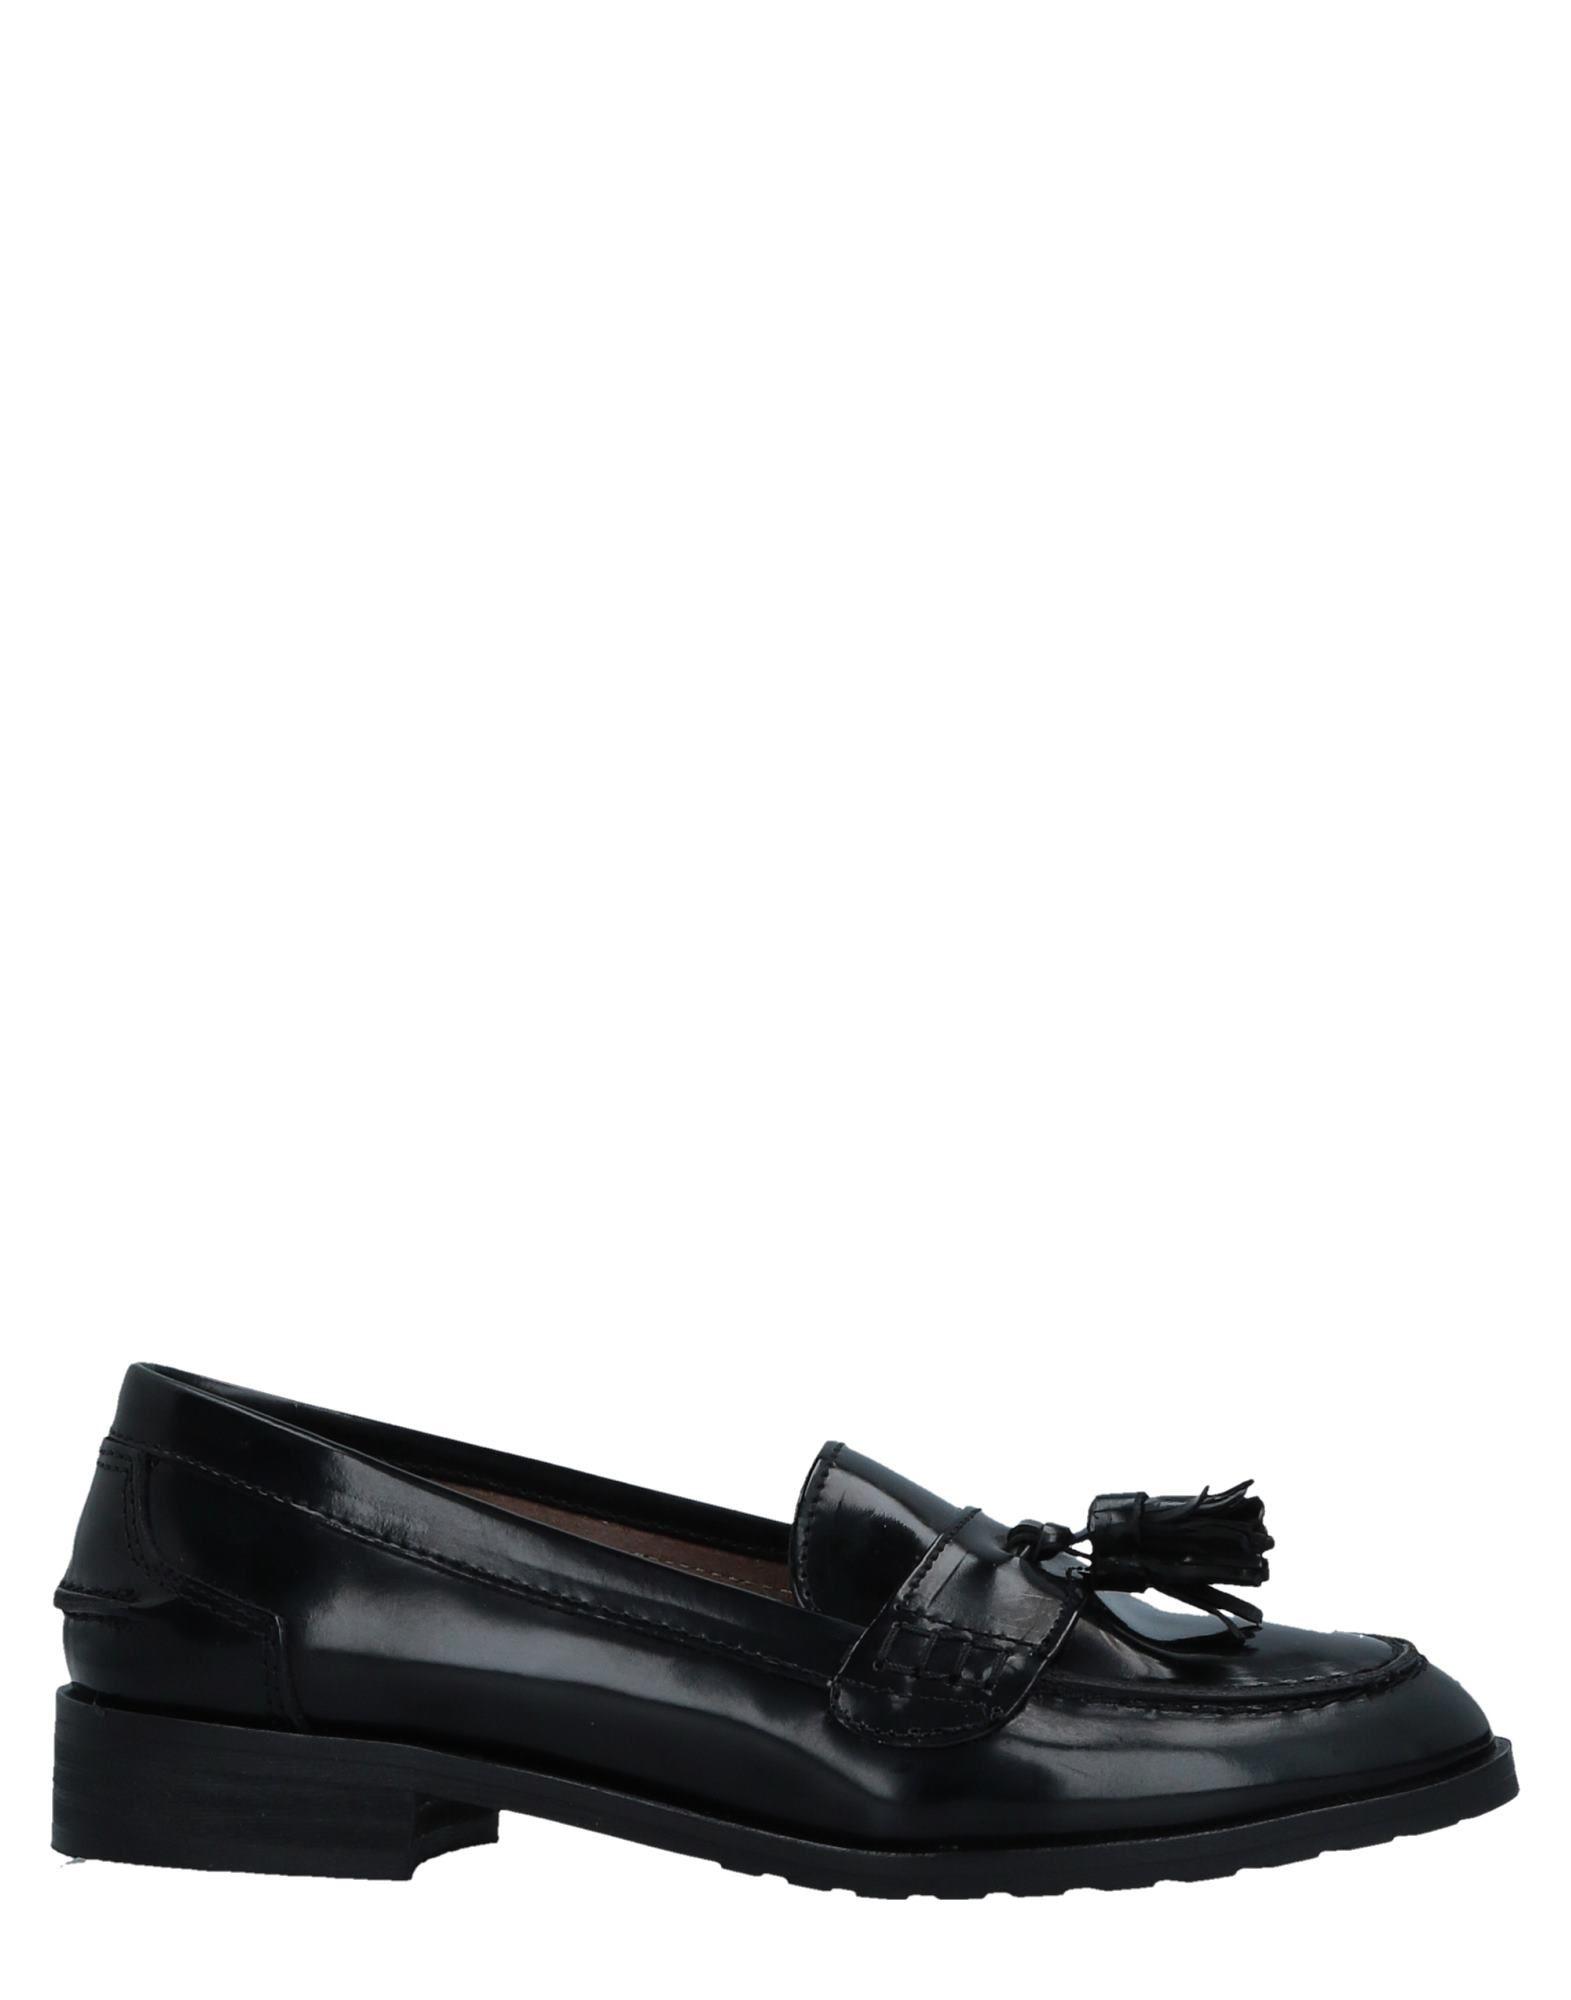 Castellanisimos® Mokassins Damen  11521330SL Gute Qualität beliebte Schuhe